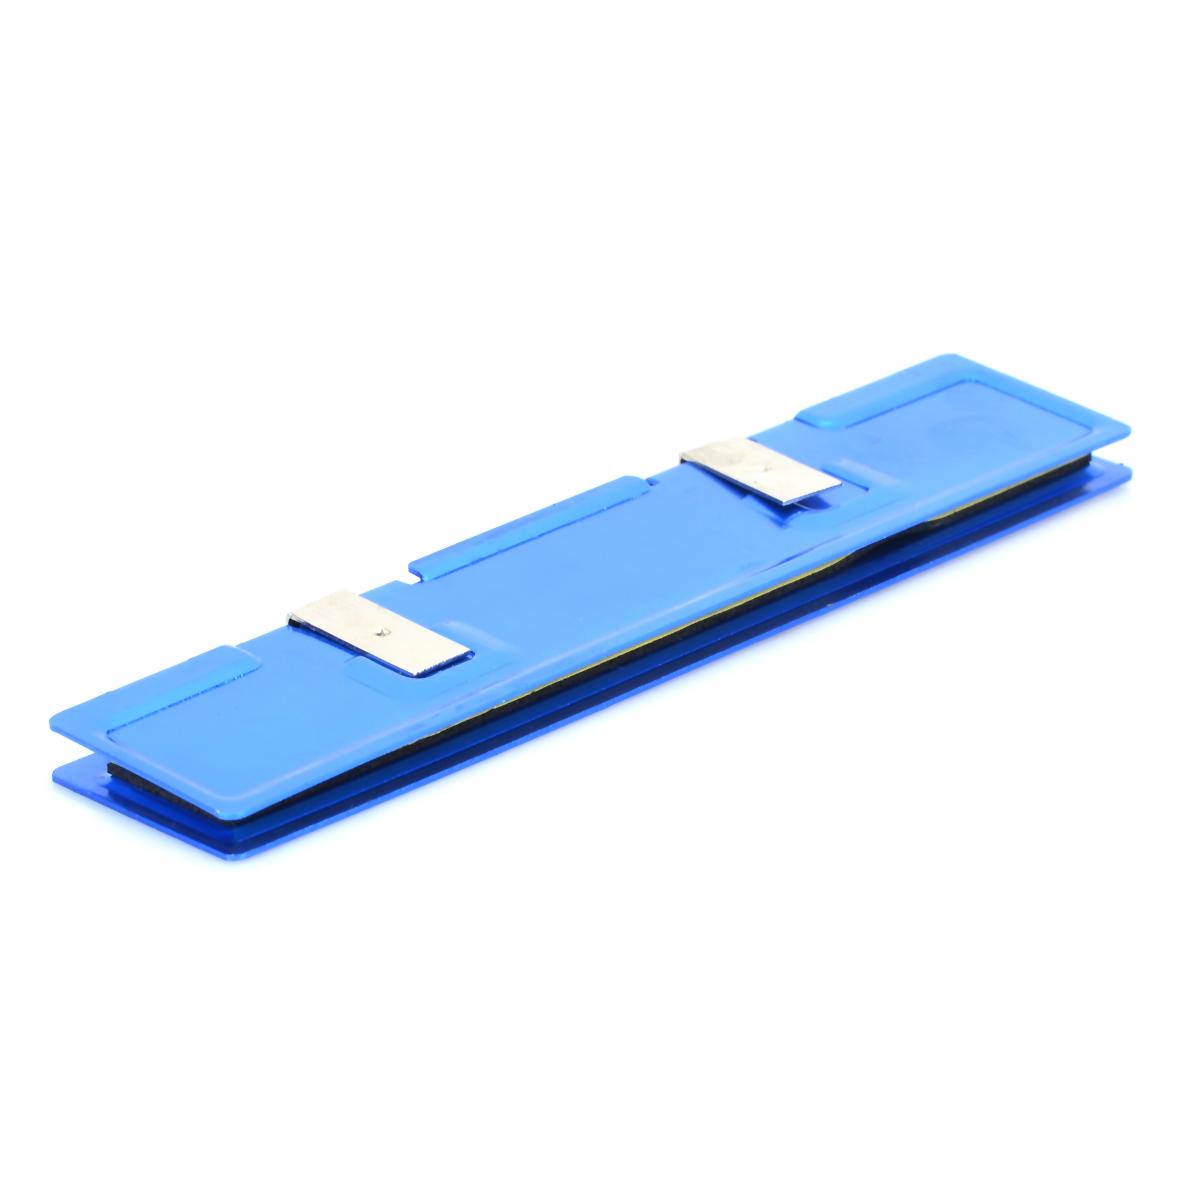 Welove 4 Step Shape Slimming Belt Korset Pelangsing Perut Cek Fcg040 Source Ybc 2 Pieces Aluminum Memory Cooler Spreader Heatsink Intl Update Harga Terkini